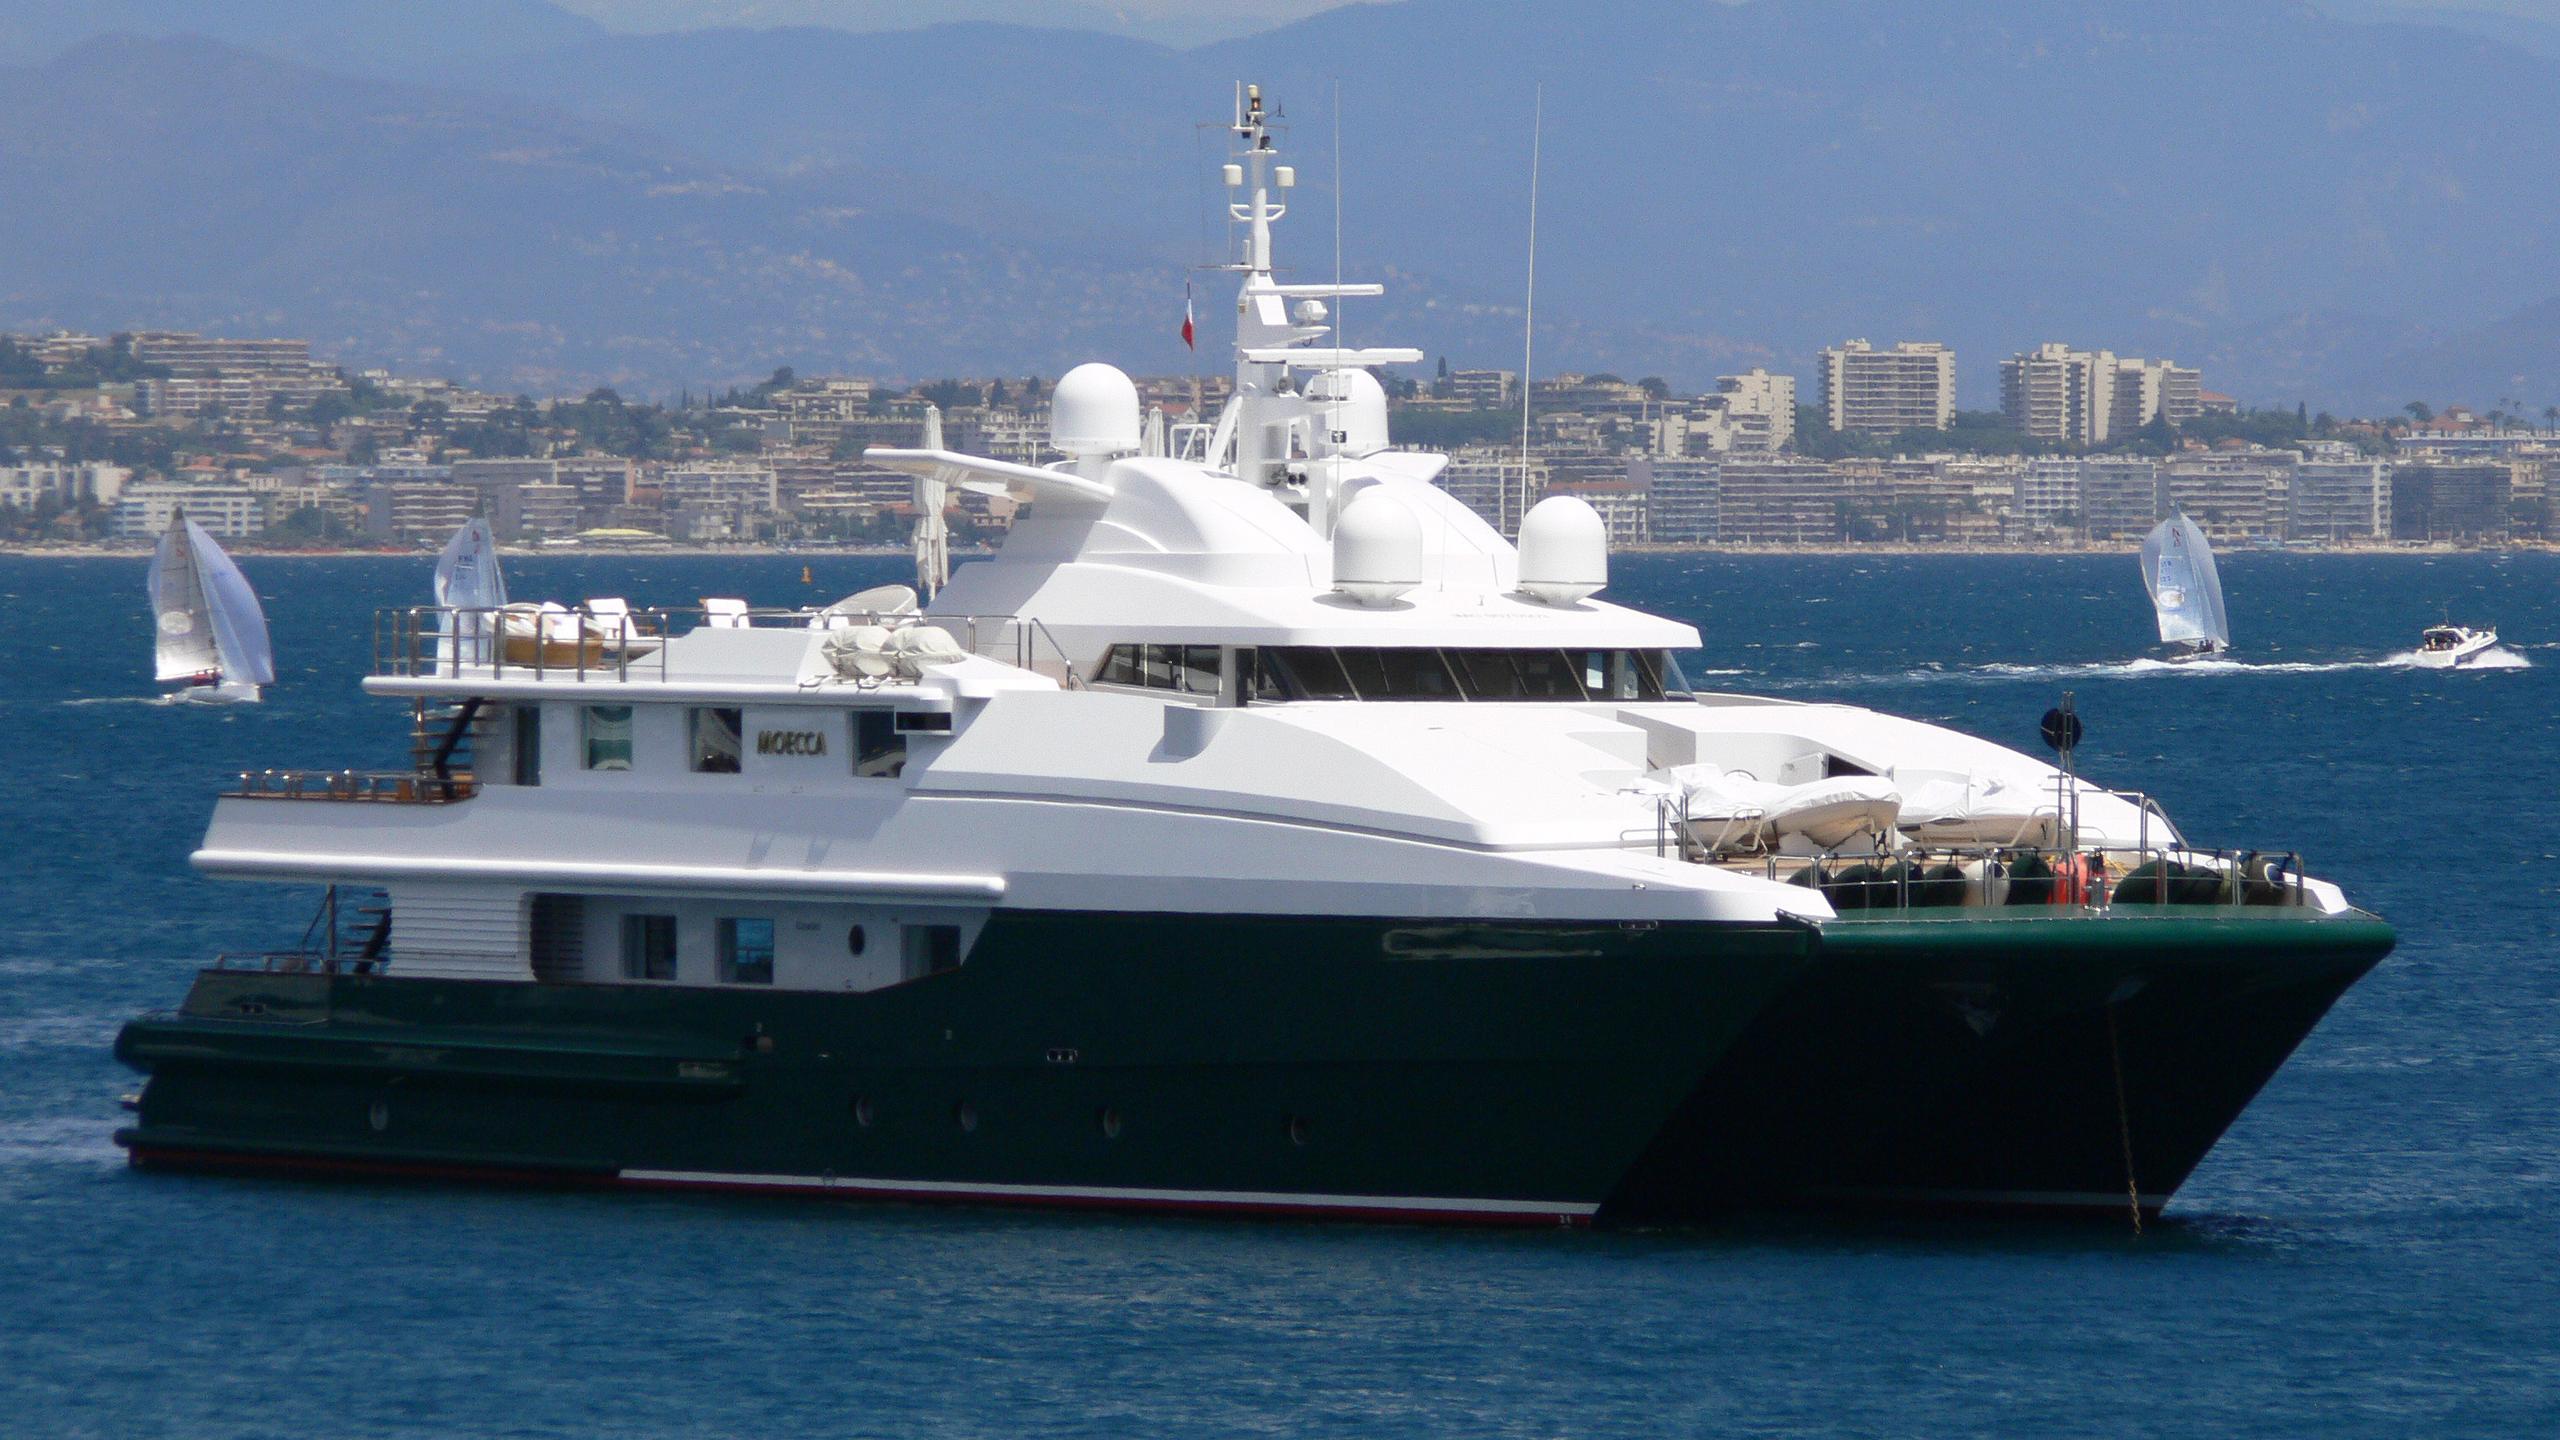 moecca-motor-yacht-oceanfast-1993-45m-profile